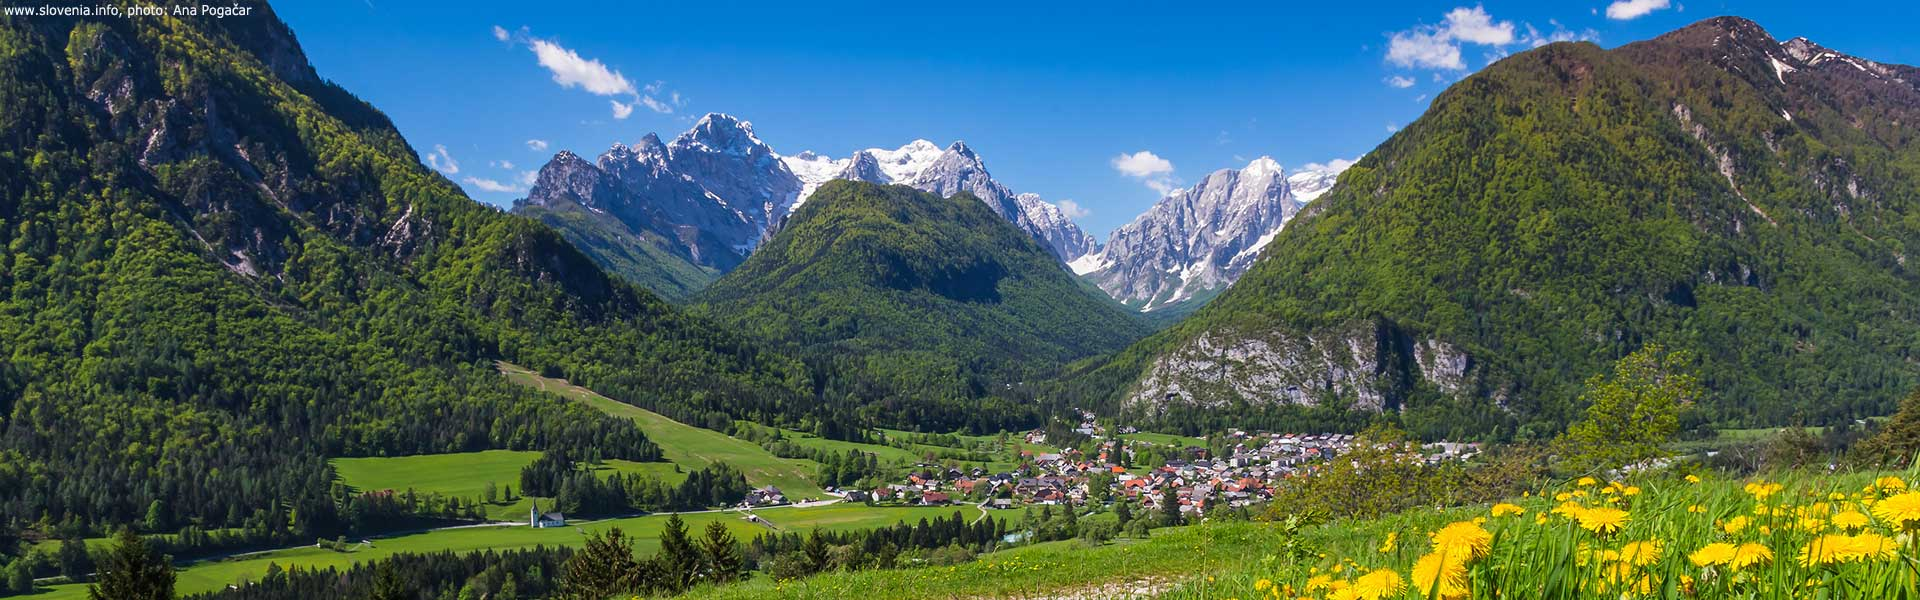 Vandreture i Slovenien